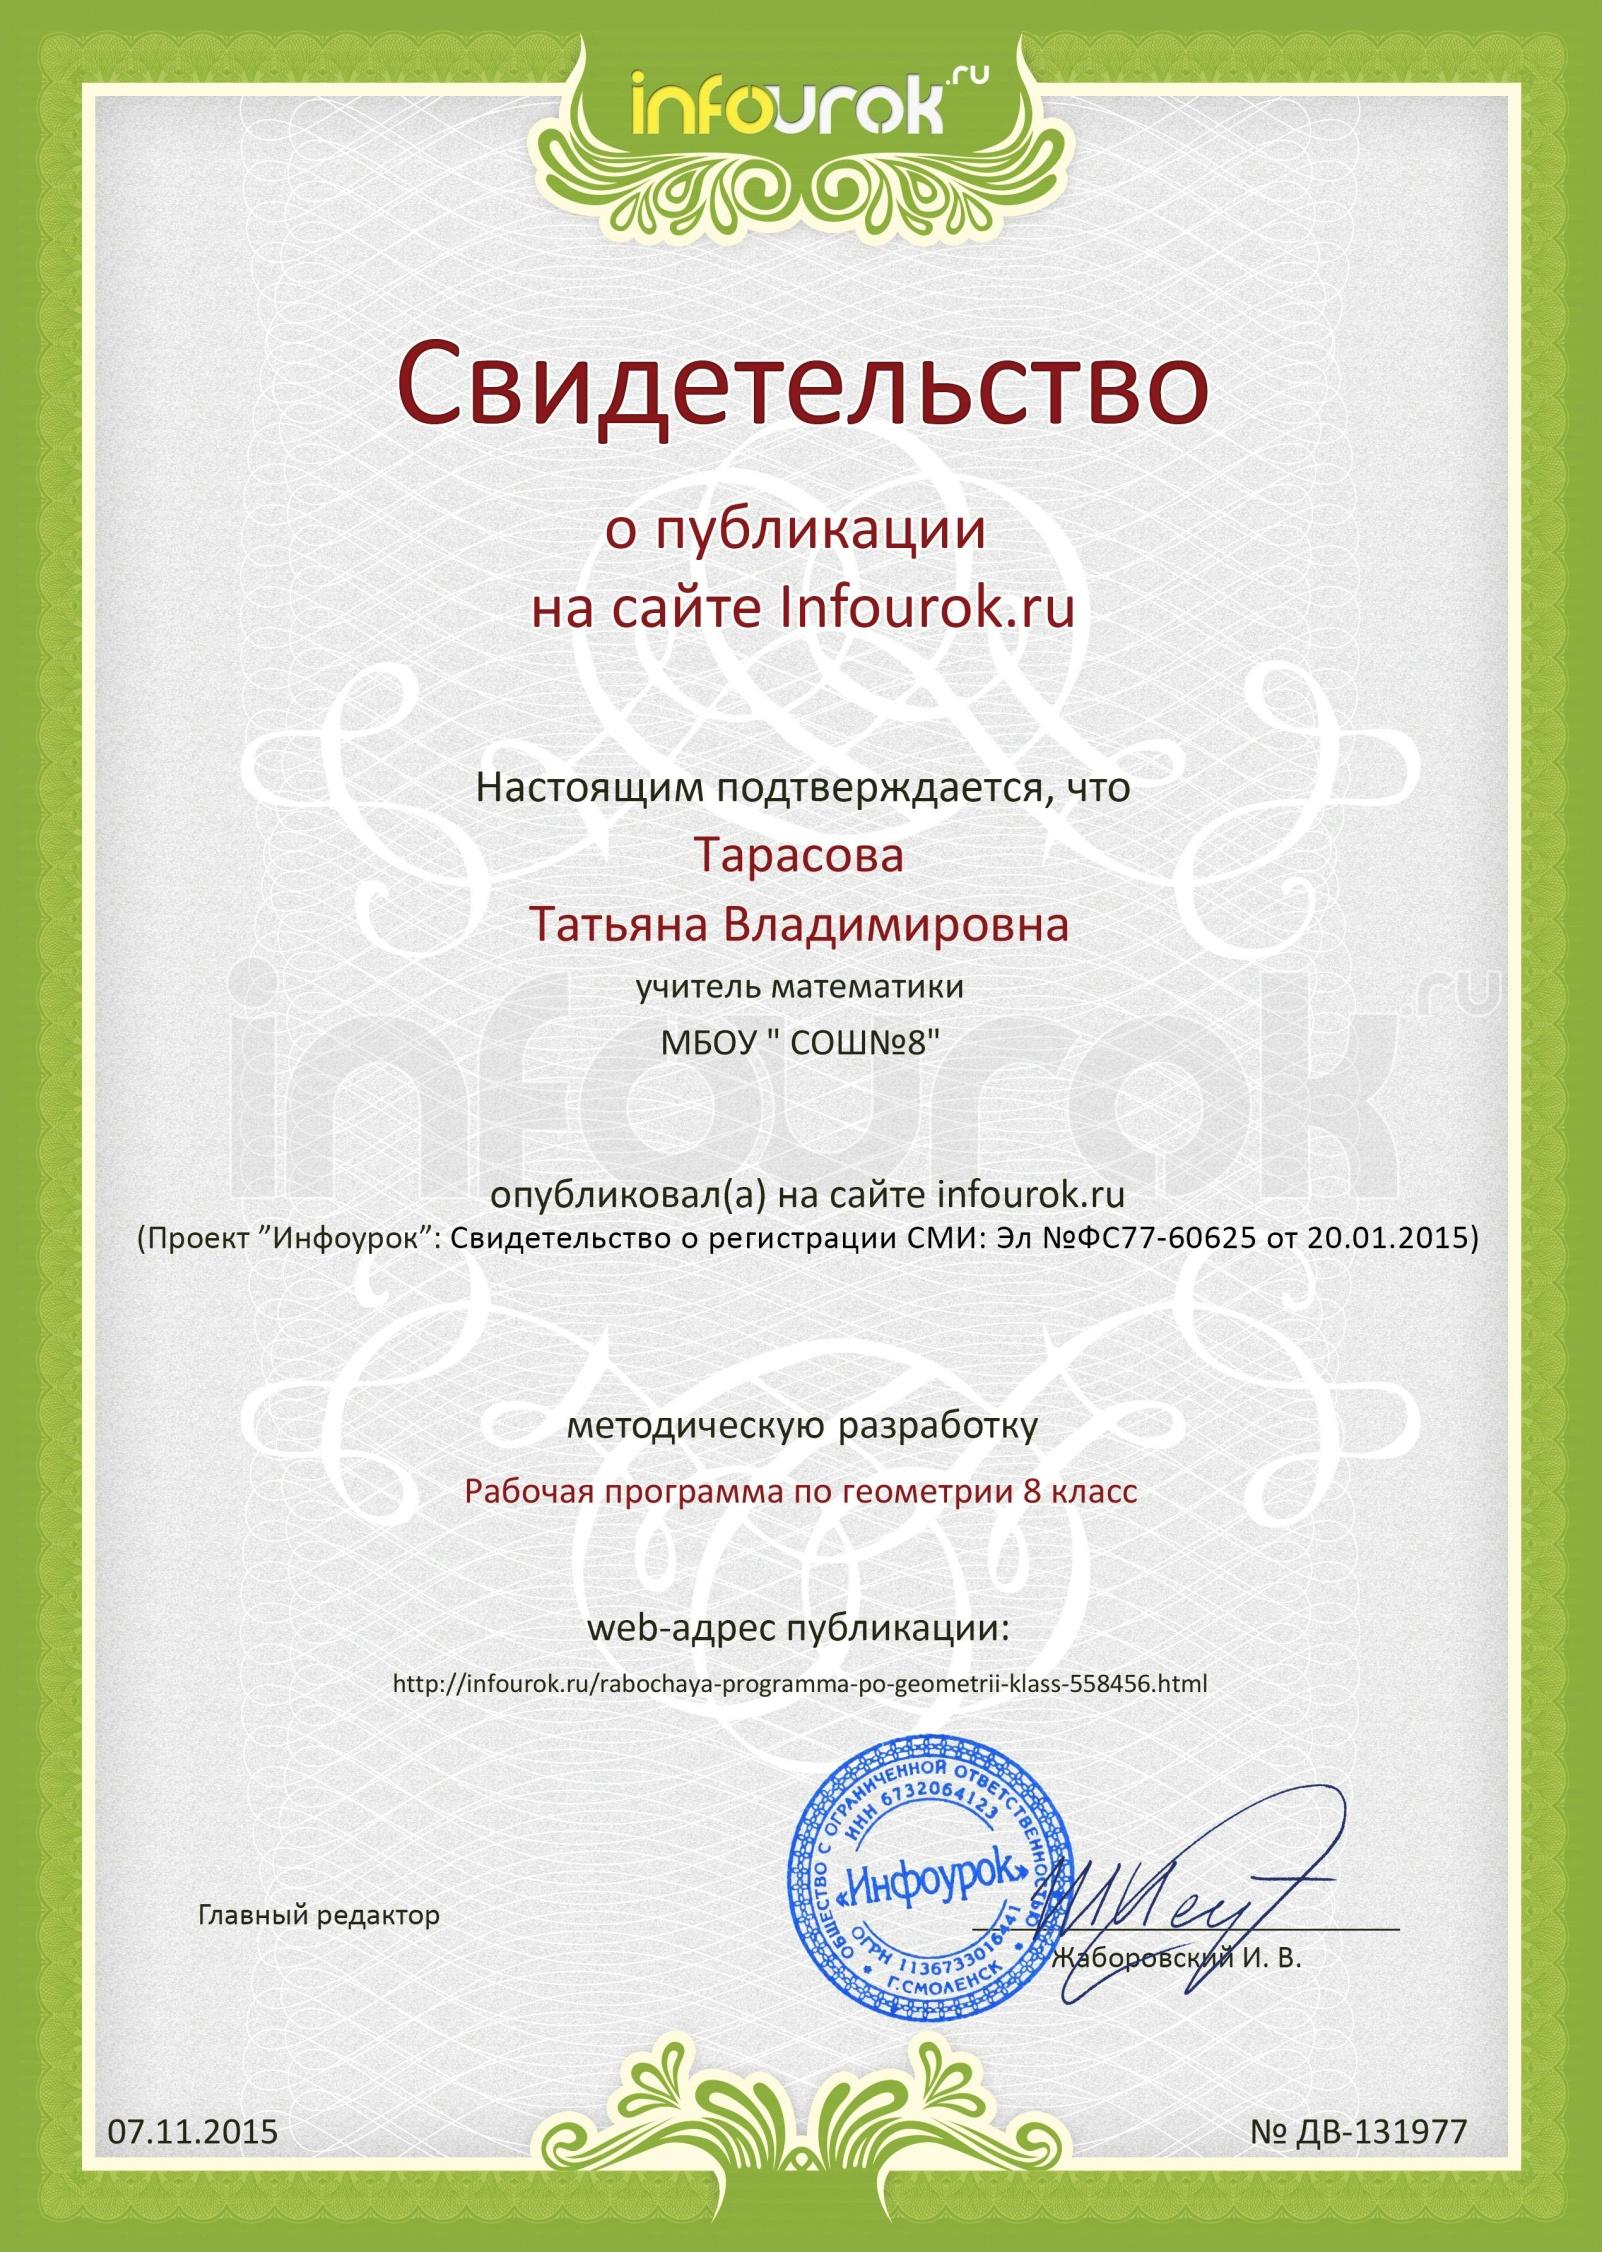 C:\Users\User\Downloads\Сертификат проекта infourok.ru № ДВ-131977.jpg